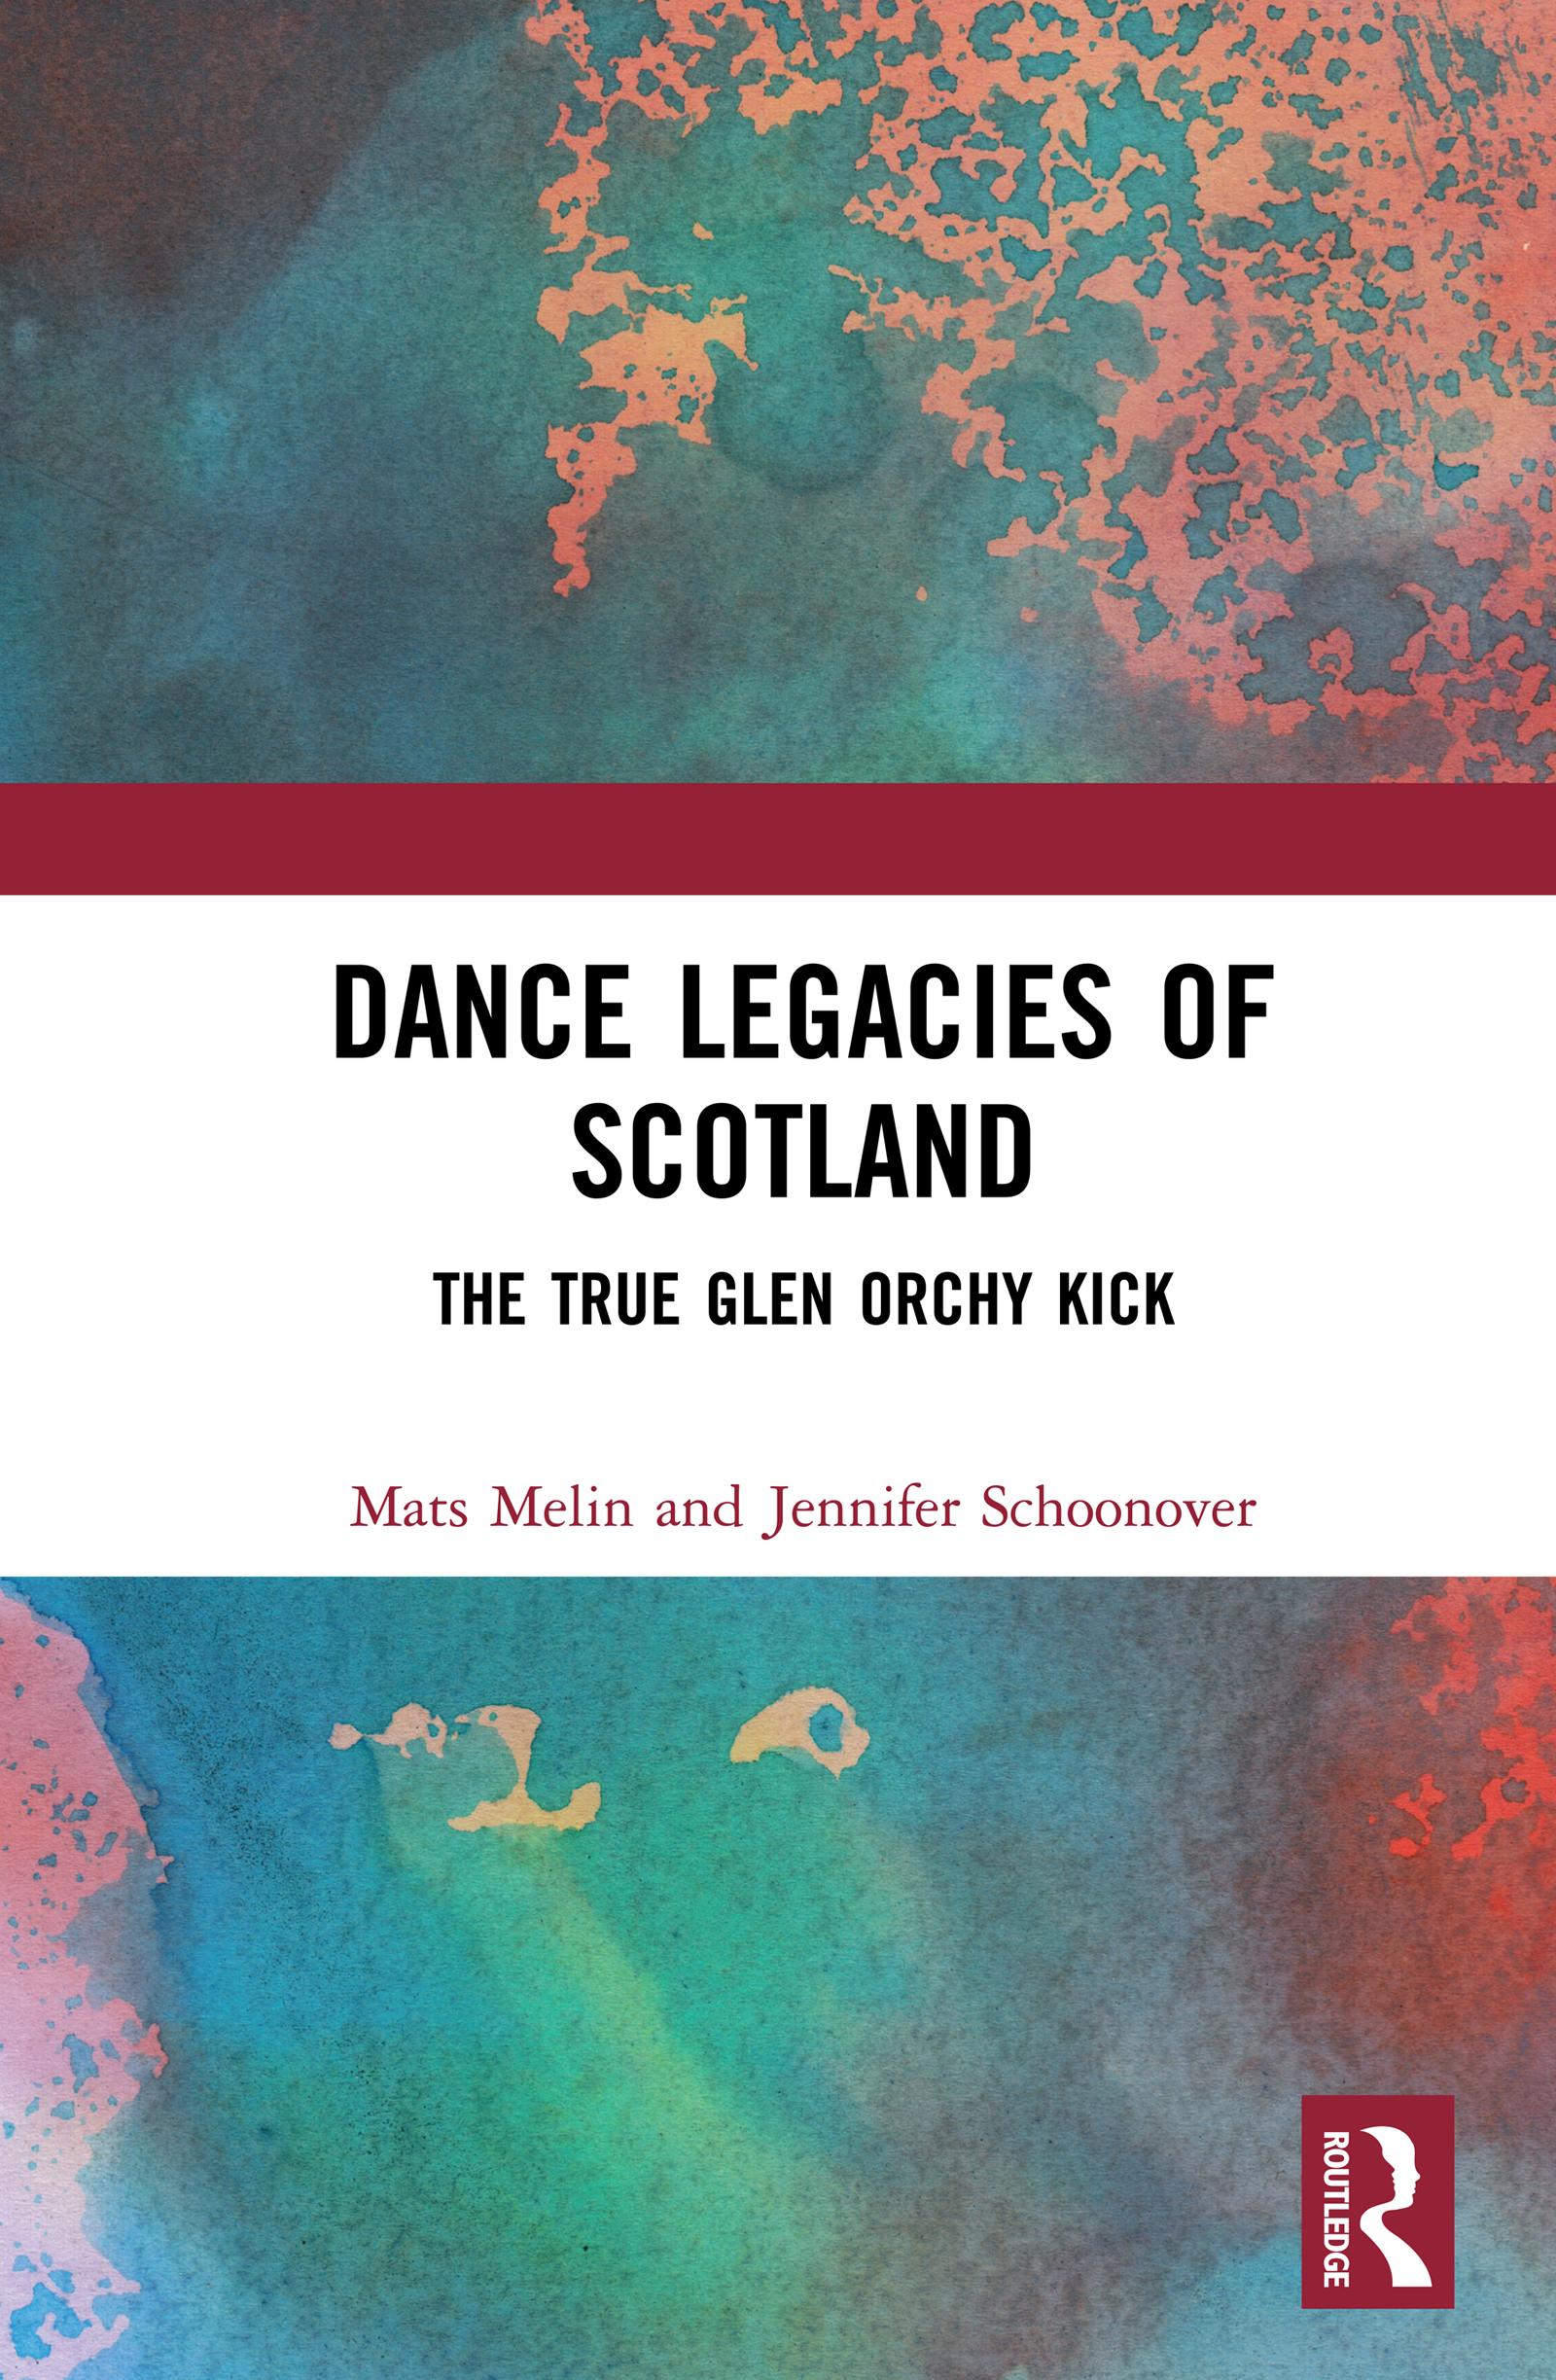 Dance Legacies of Scotland